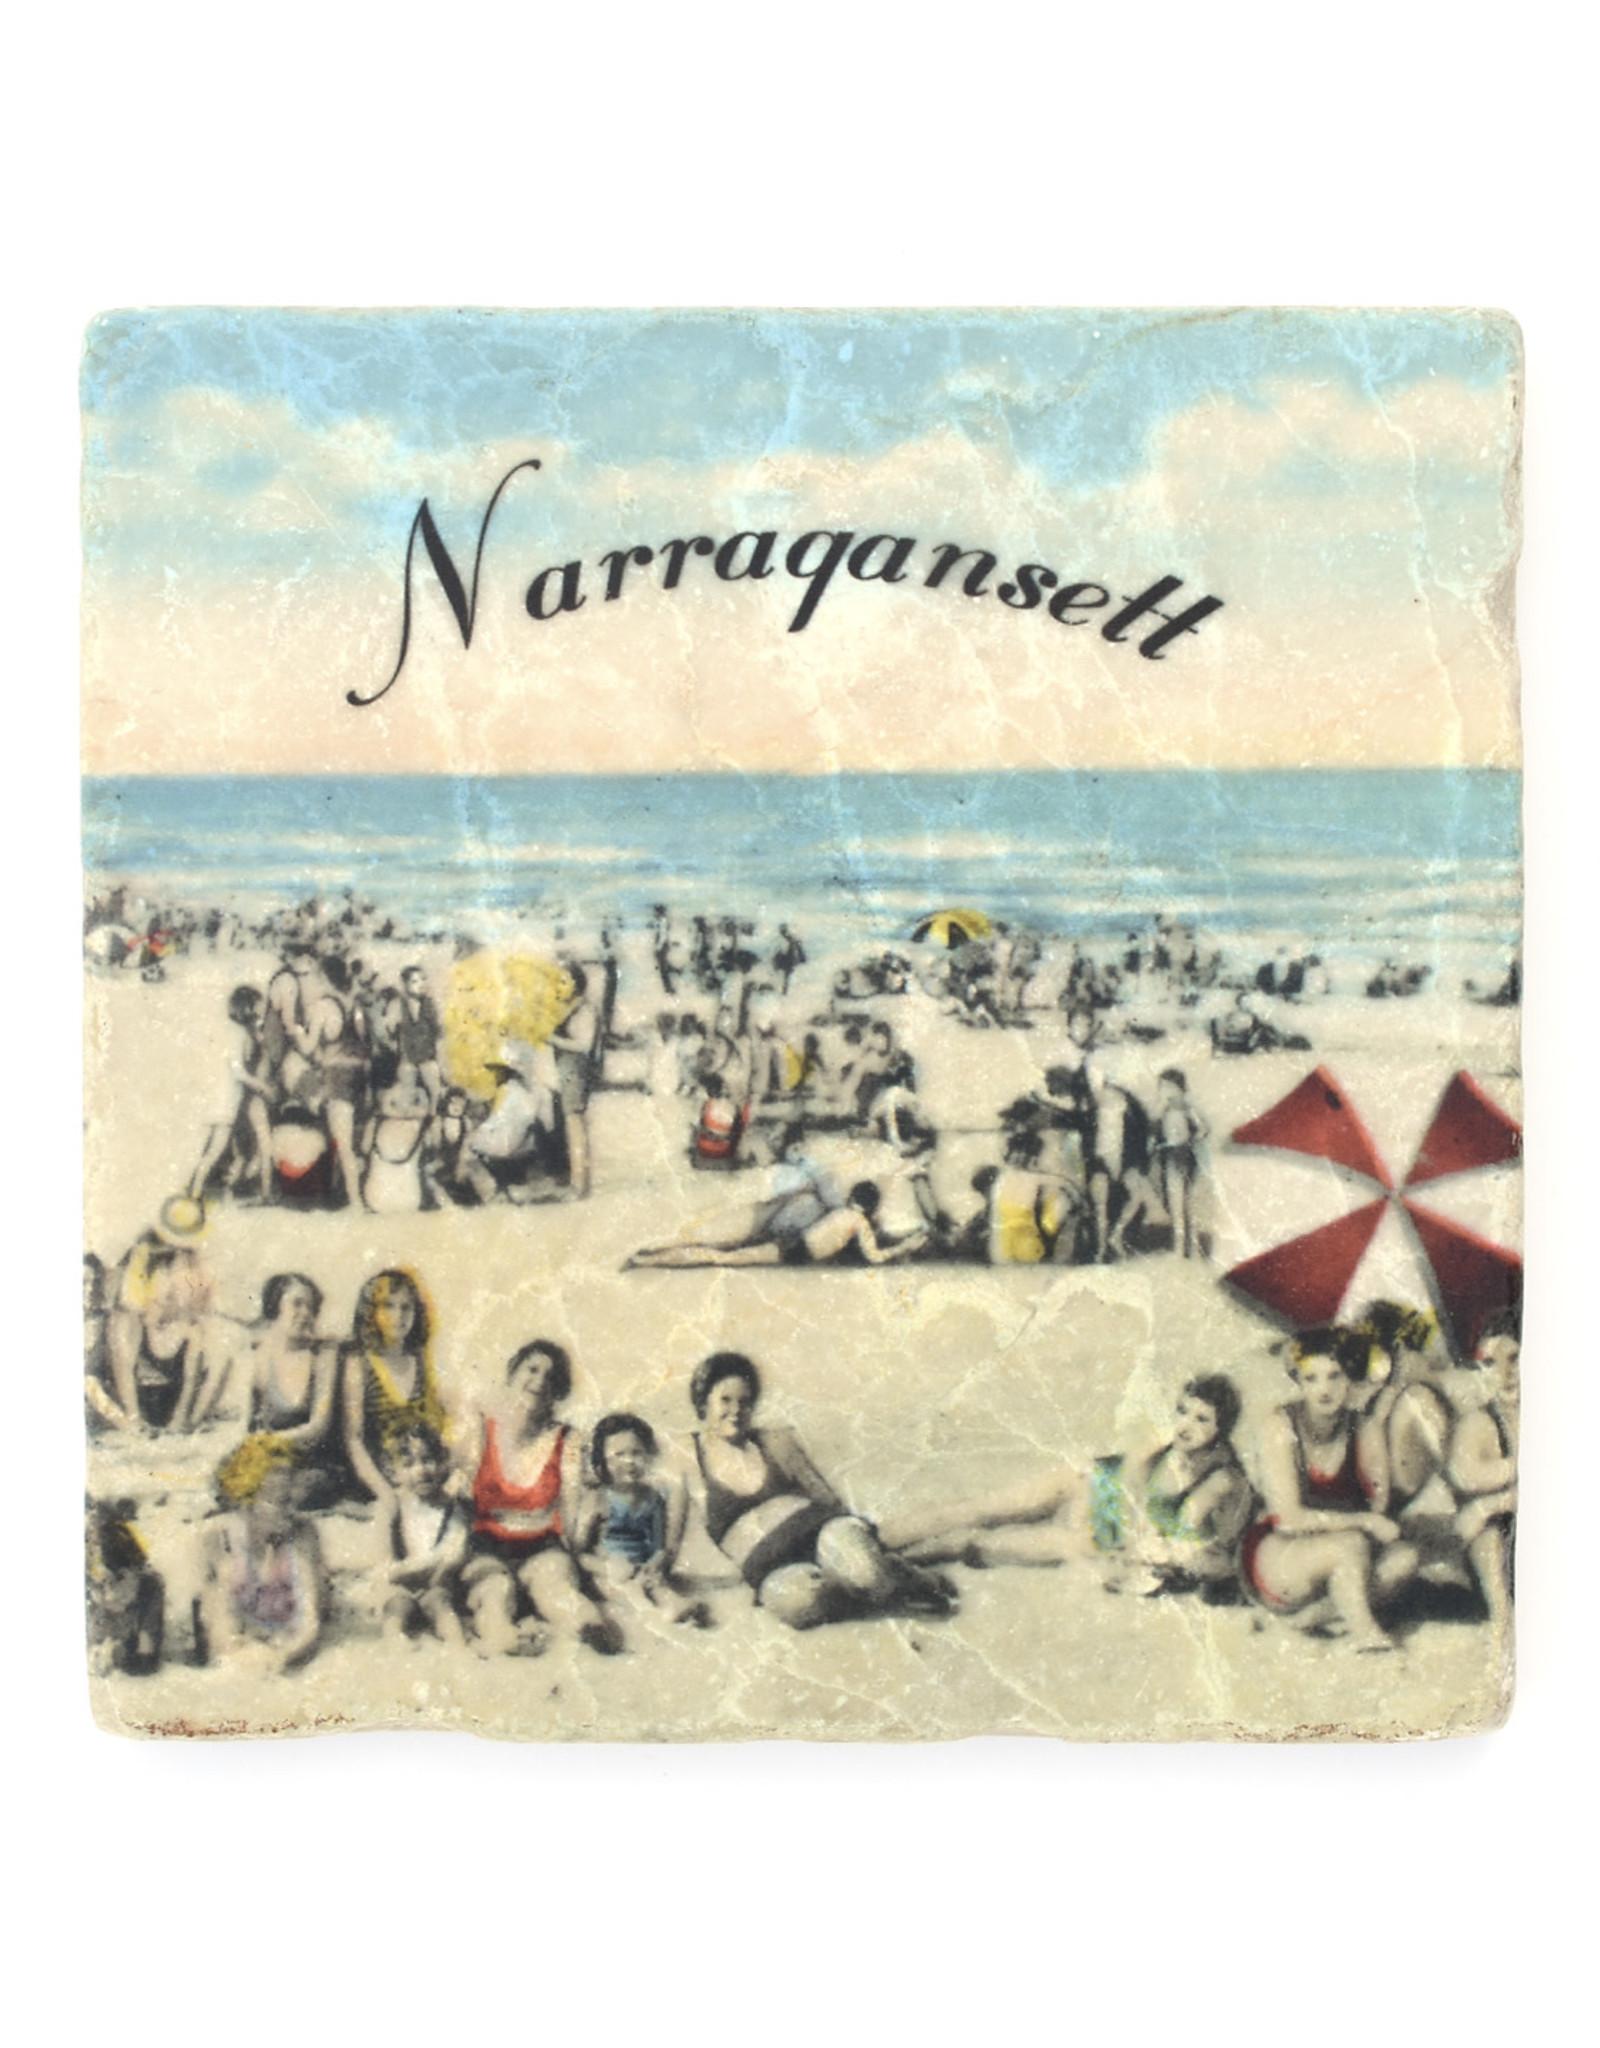 Narragansett Beach Coaster